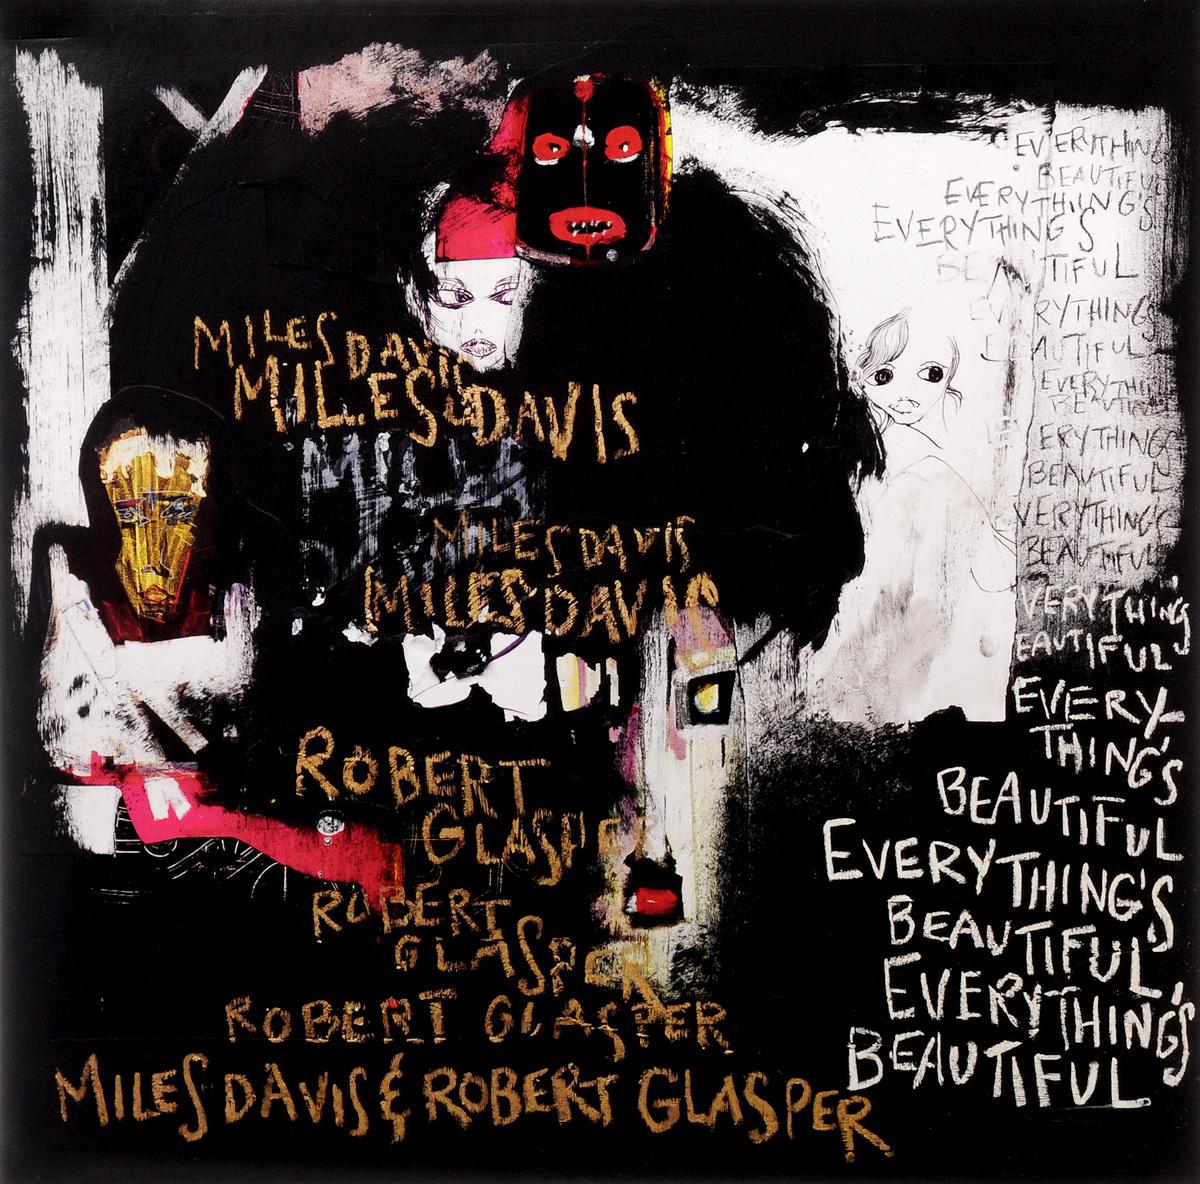 лучшая цена Майлз Дэвис,Роберт Глеспер Miles Davis & Robert Glasper. Everything's Beautiful (LP)